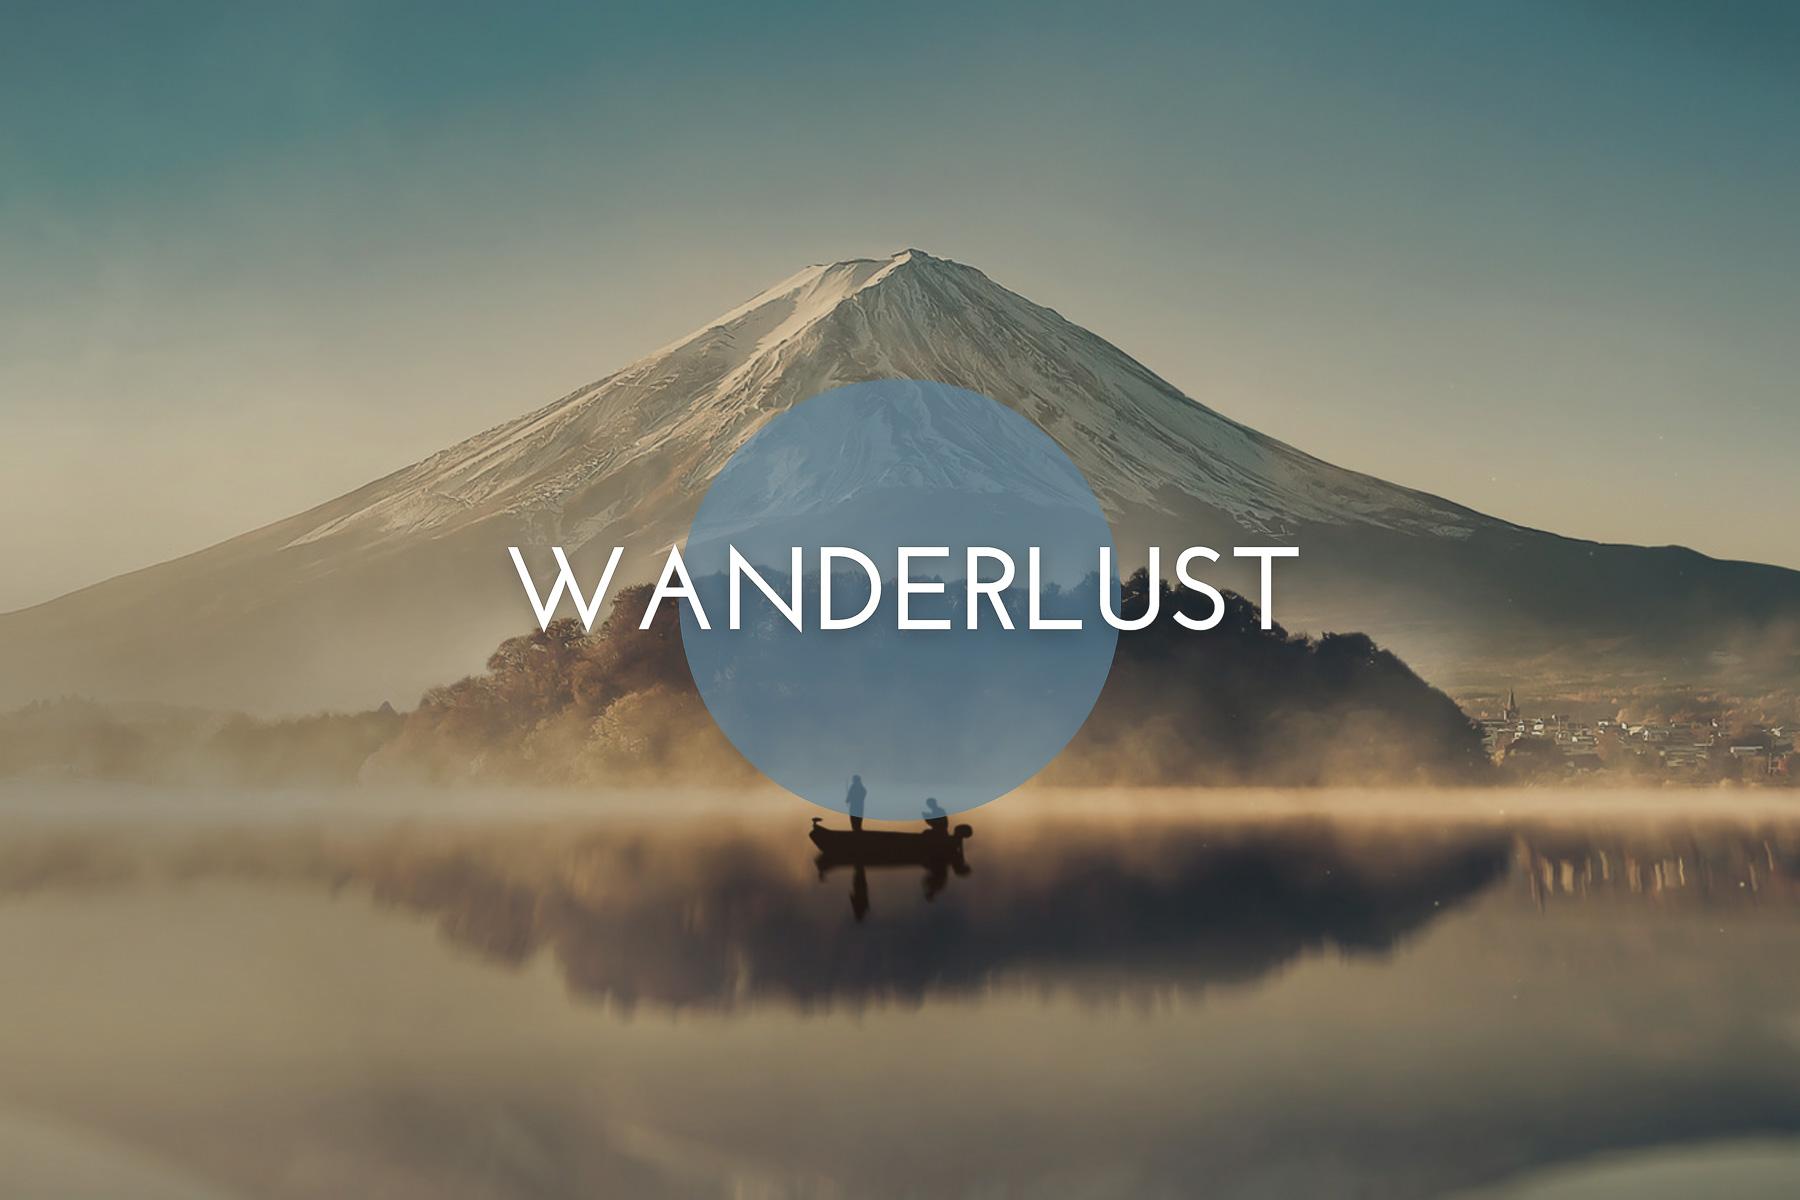 DxO Wanderlust presets from PixaFOTO.com